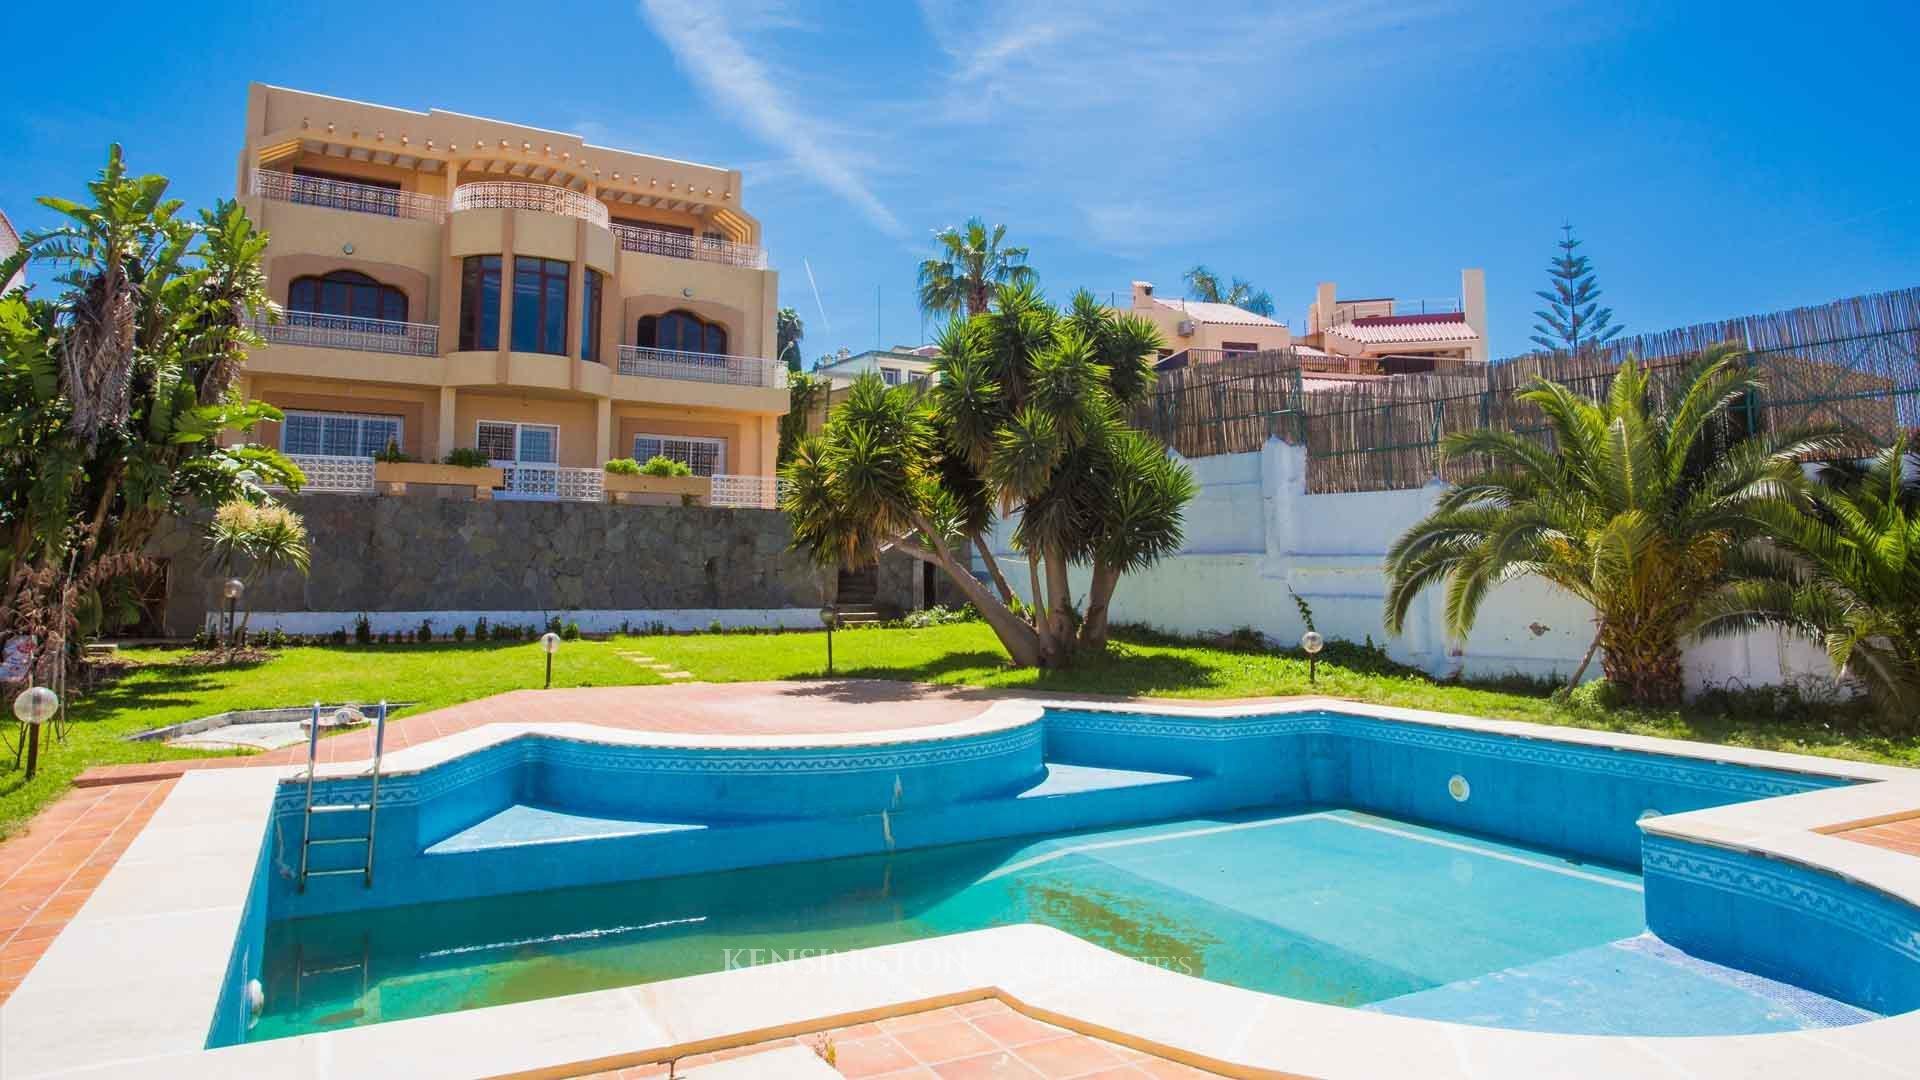 KPPM01243: Villa Mouja Luxury Villa Tanger Morocco